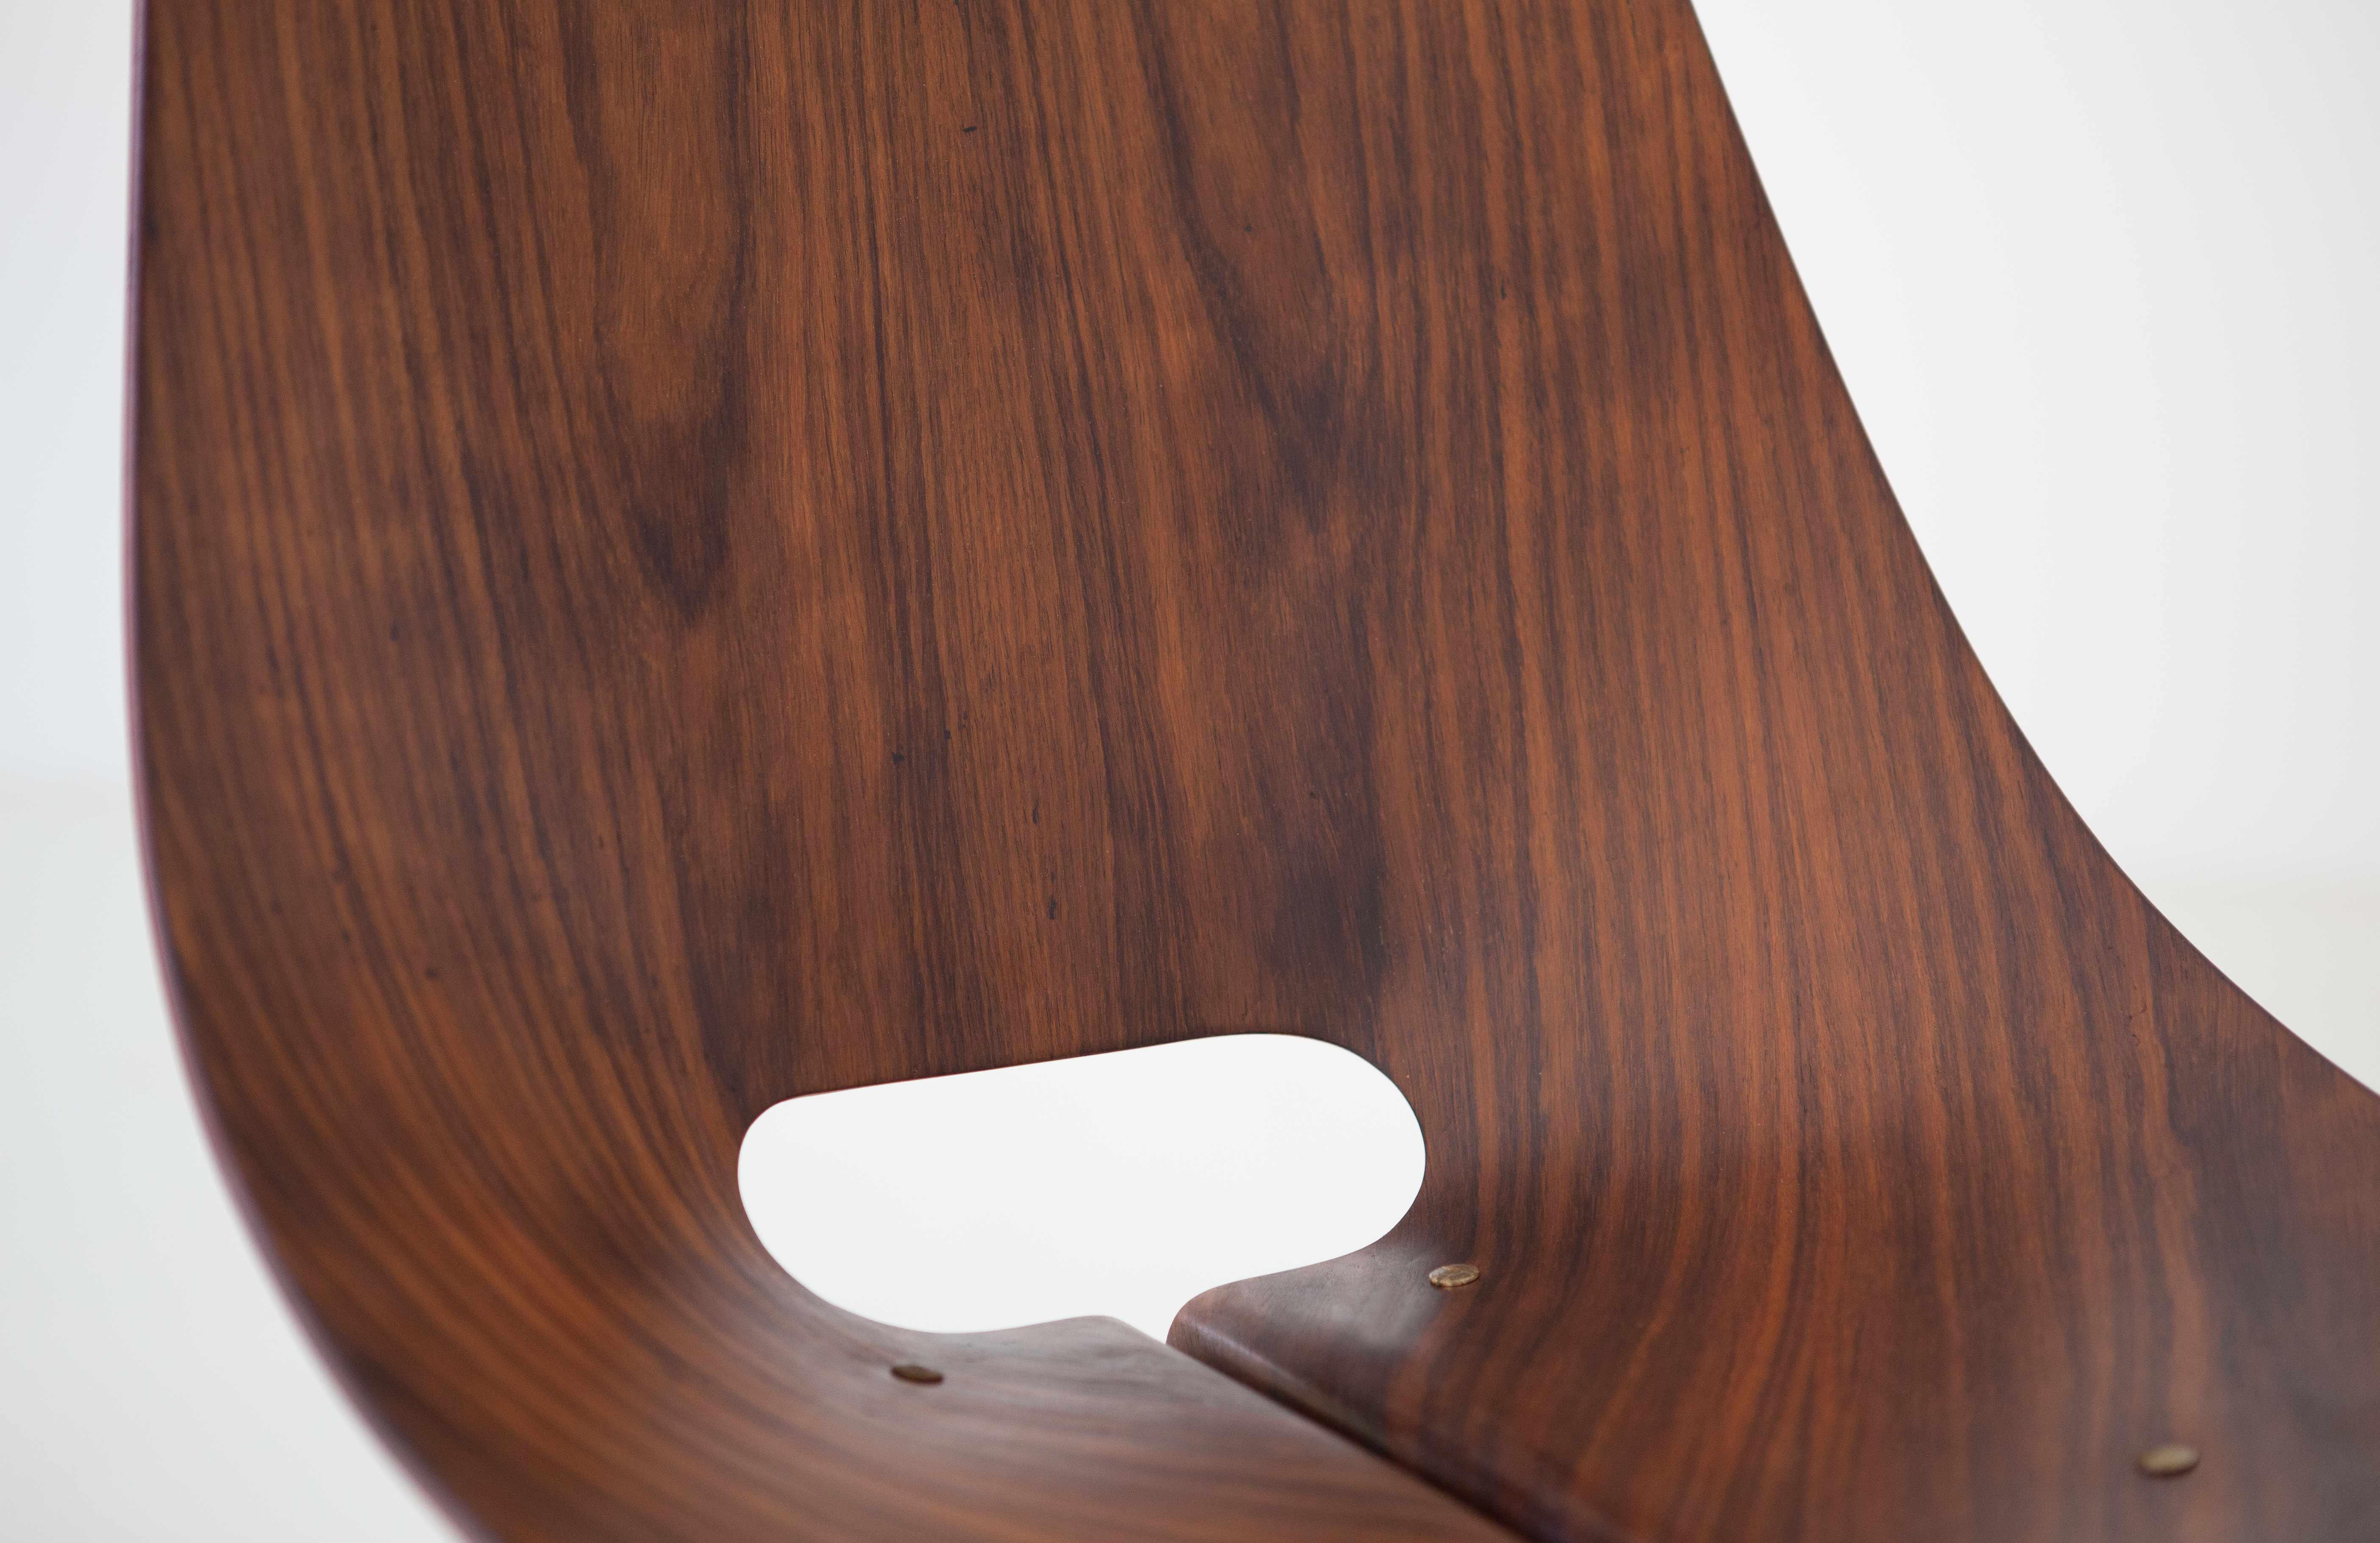 1950s-modern-curved-rosewood-chair-by-societa-compensati-curvati-1-se312